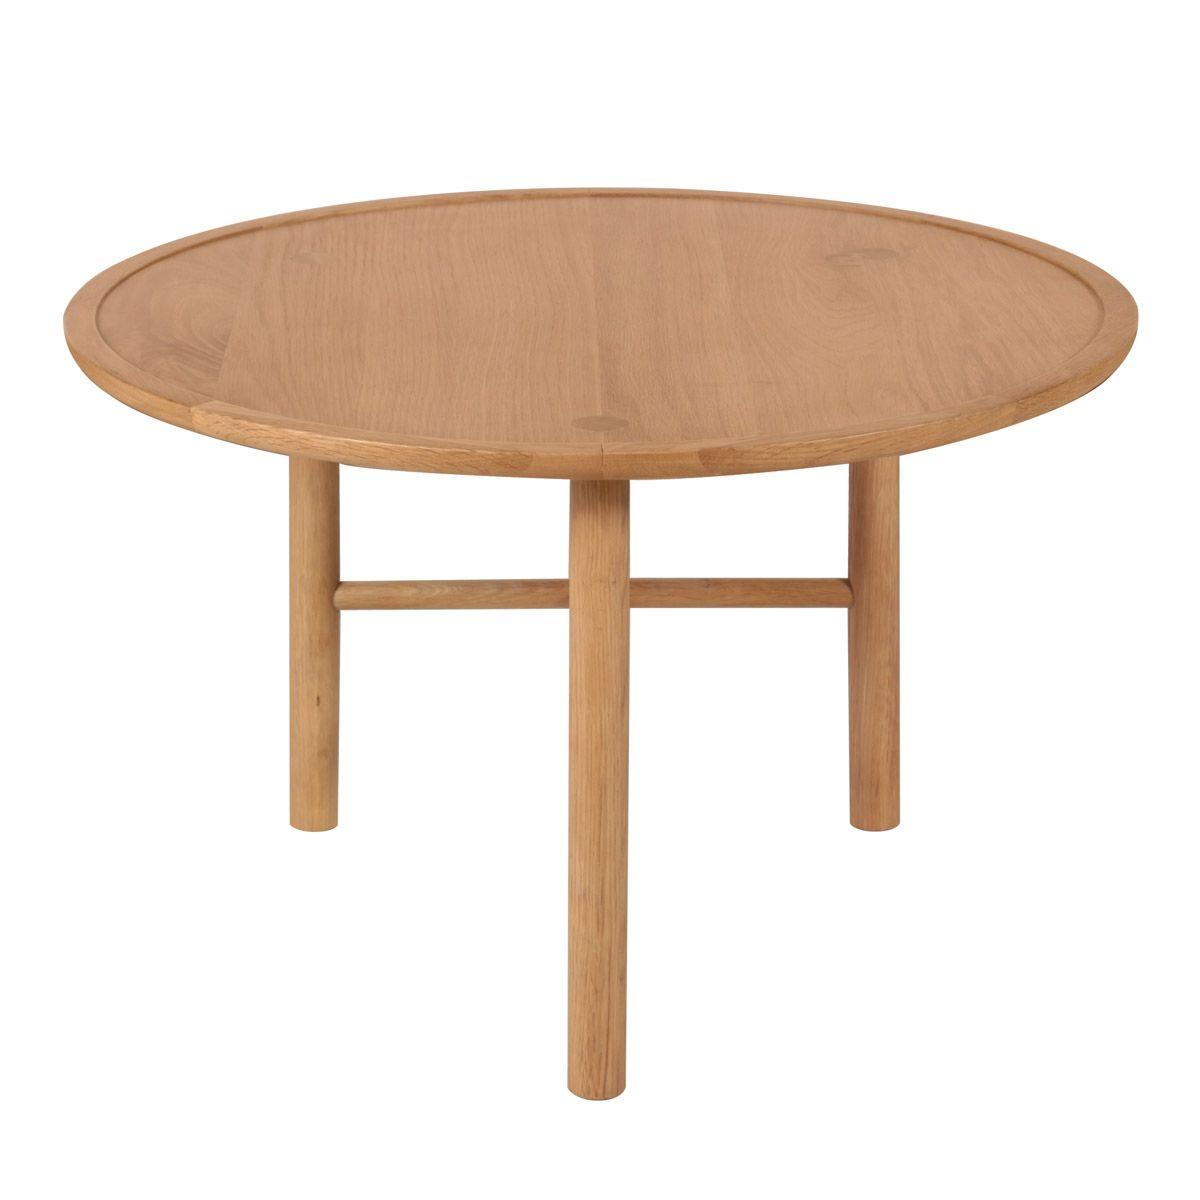 Table basse style naturel en chêne D 70 cm